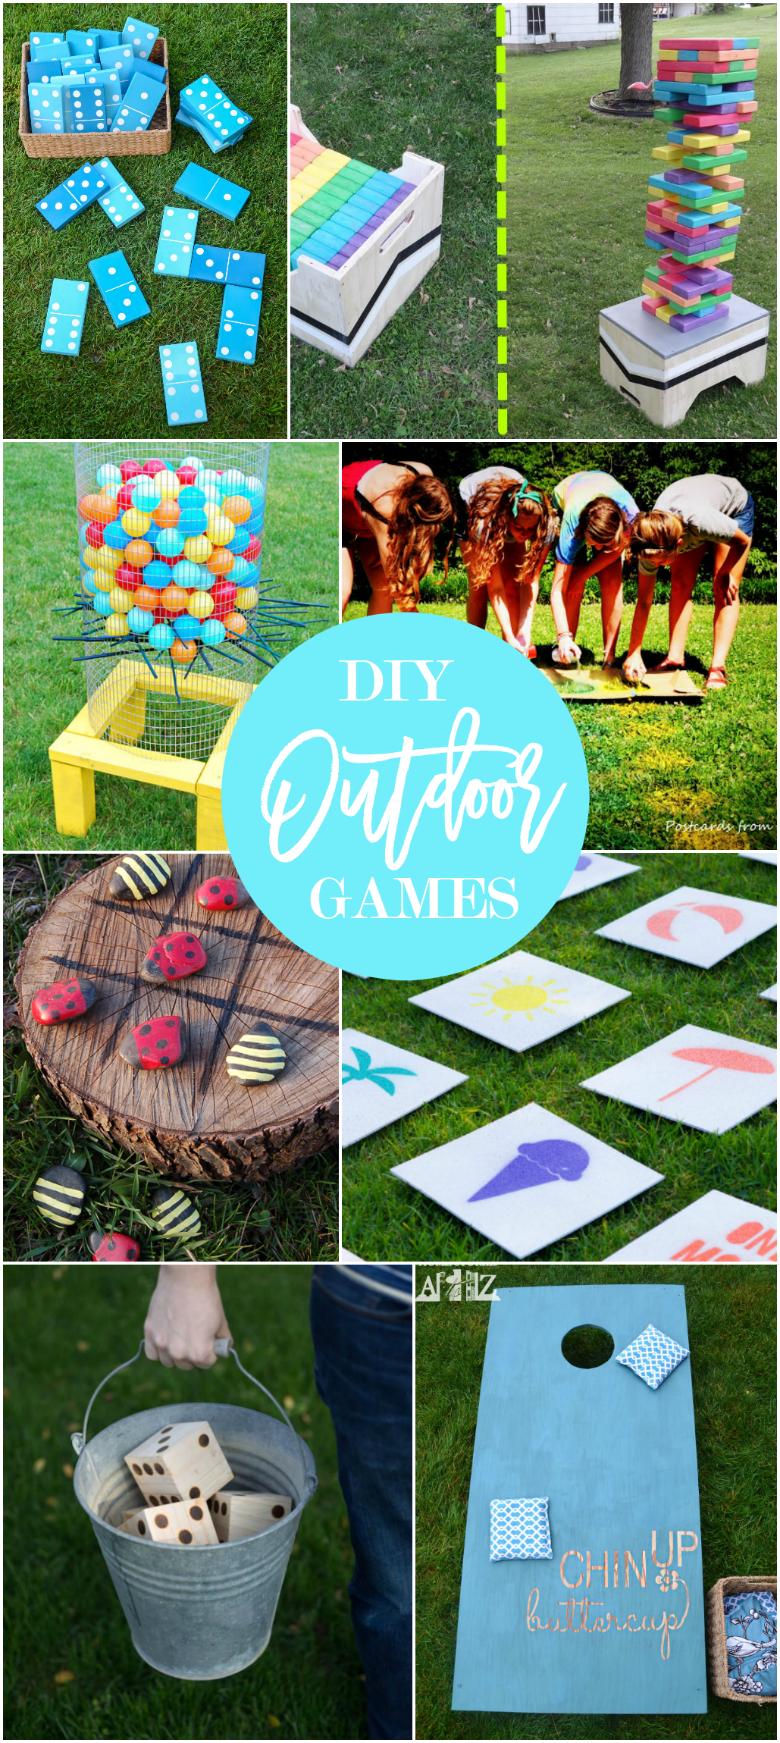 17 diy games for outdoor family fun diy games family affair and